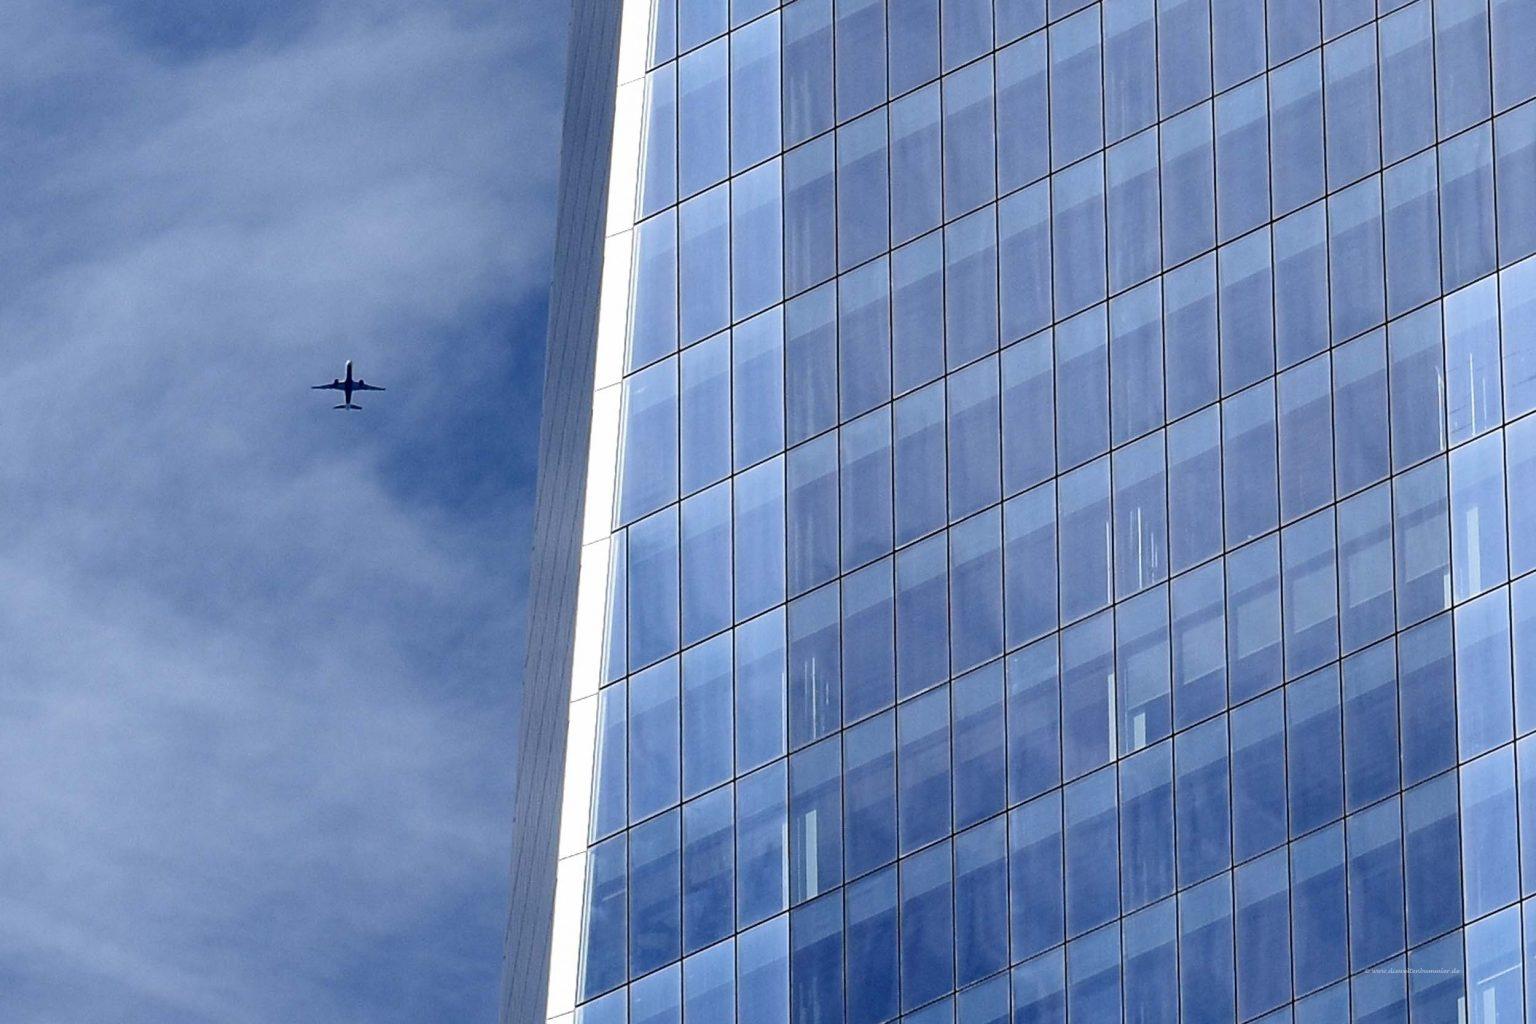 Flugzeug über dem One World Trade Center